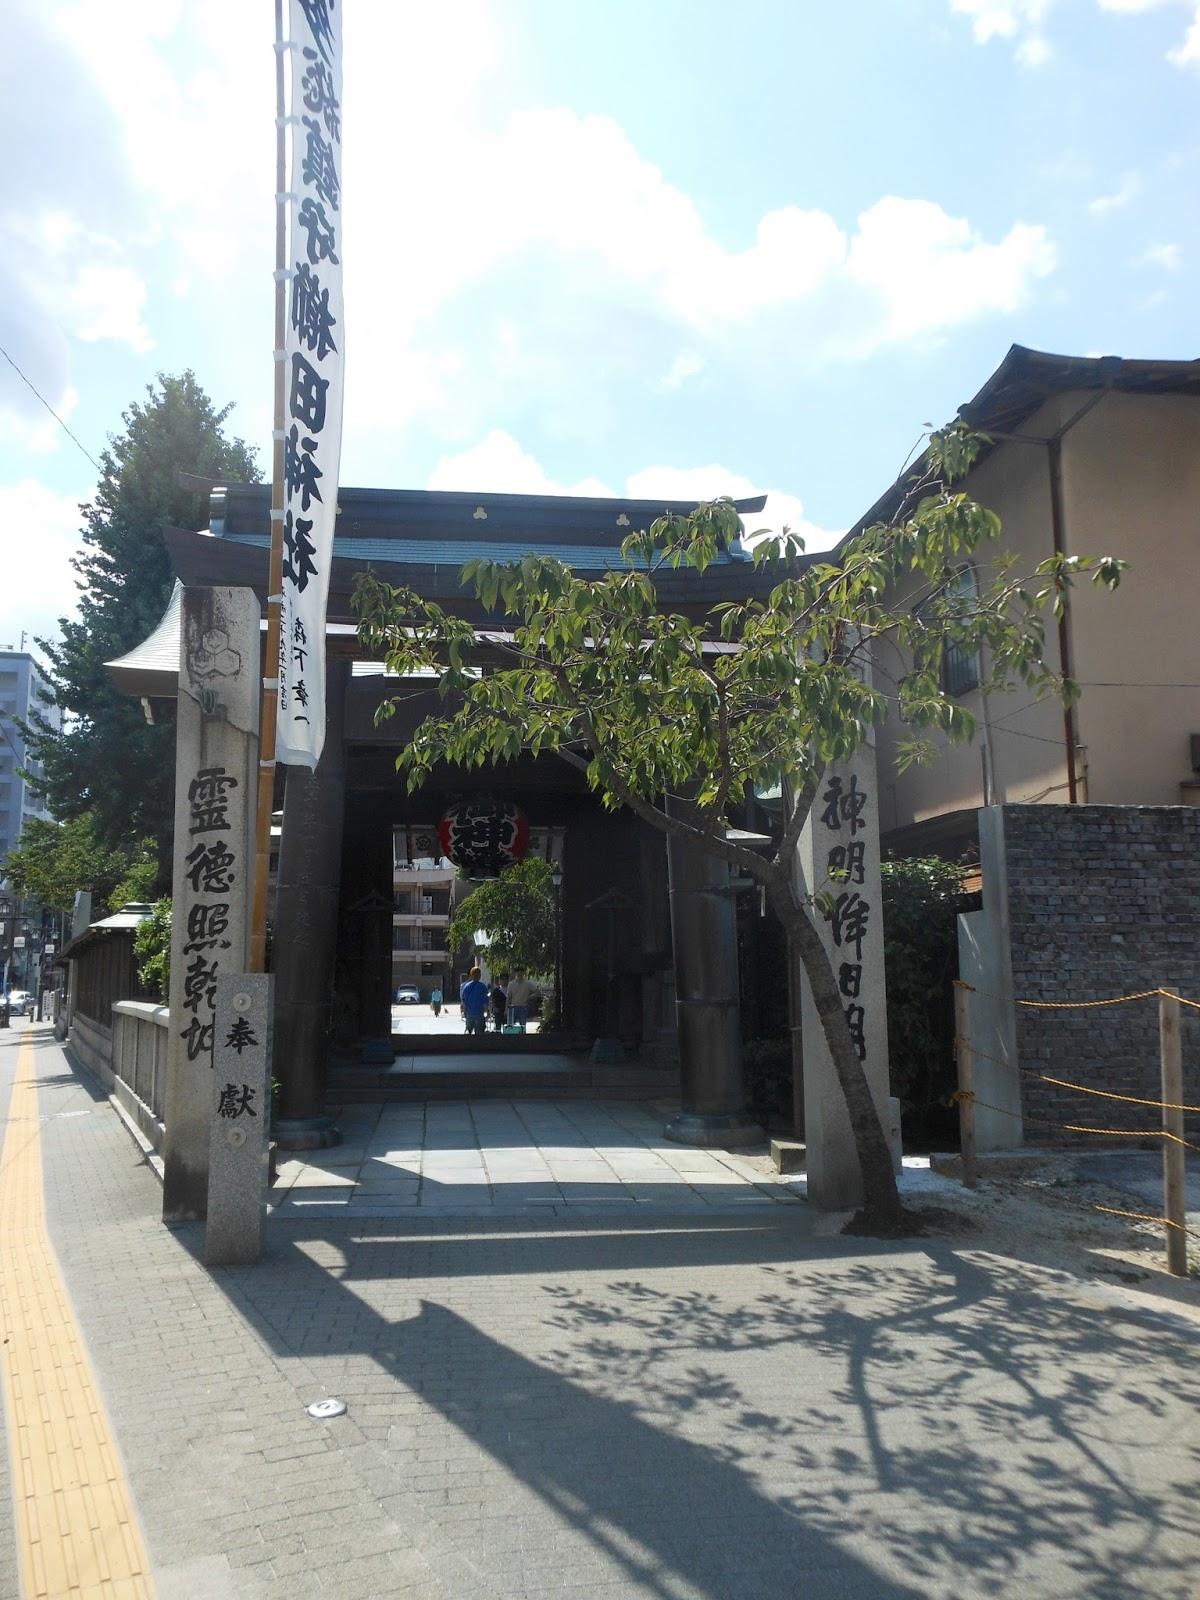 Hokkaido Kudasai: Fukuoka - Kushida Shrine and Asian Art ...